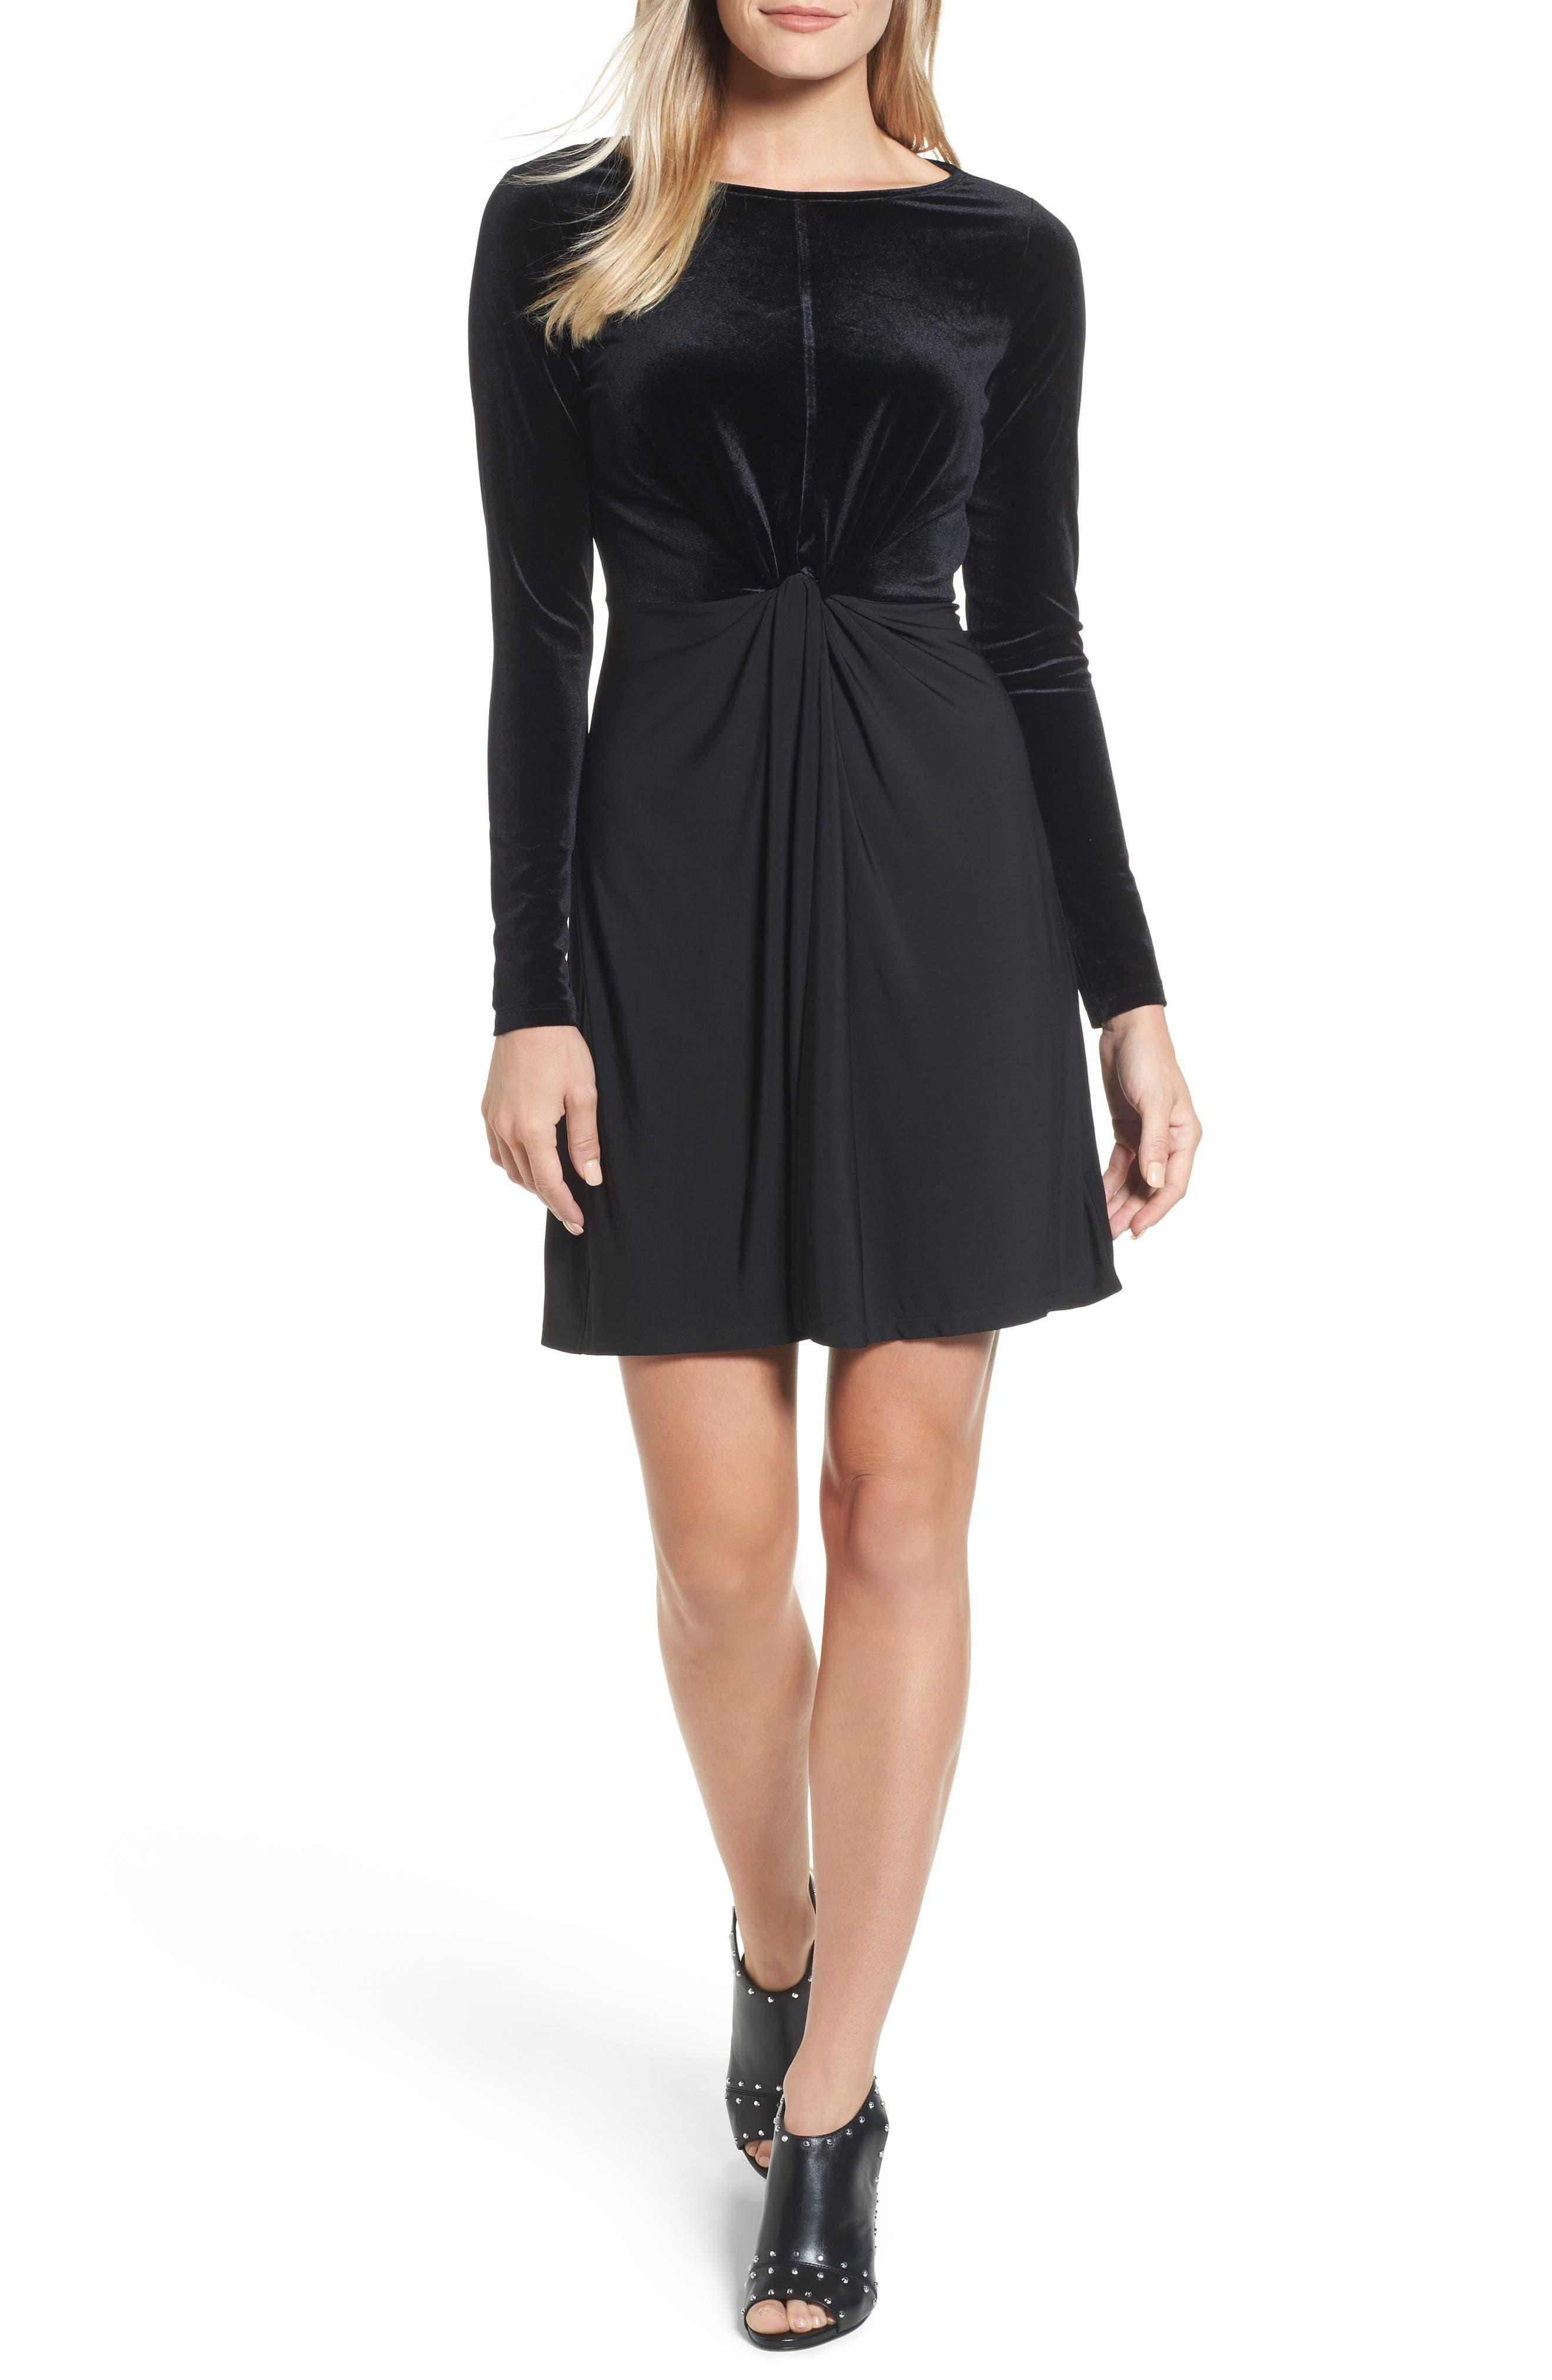 Alternate Image 1 Selected - MICHAEL Michael Kors Velvet Mix Twist Dress